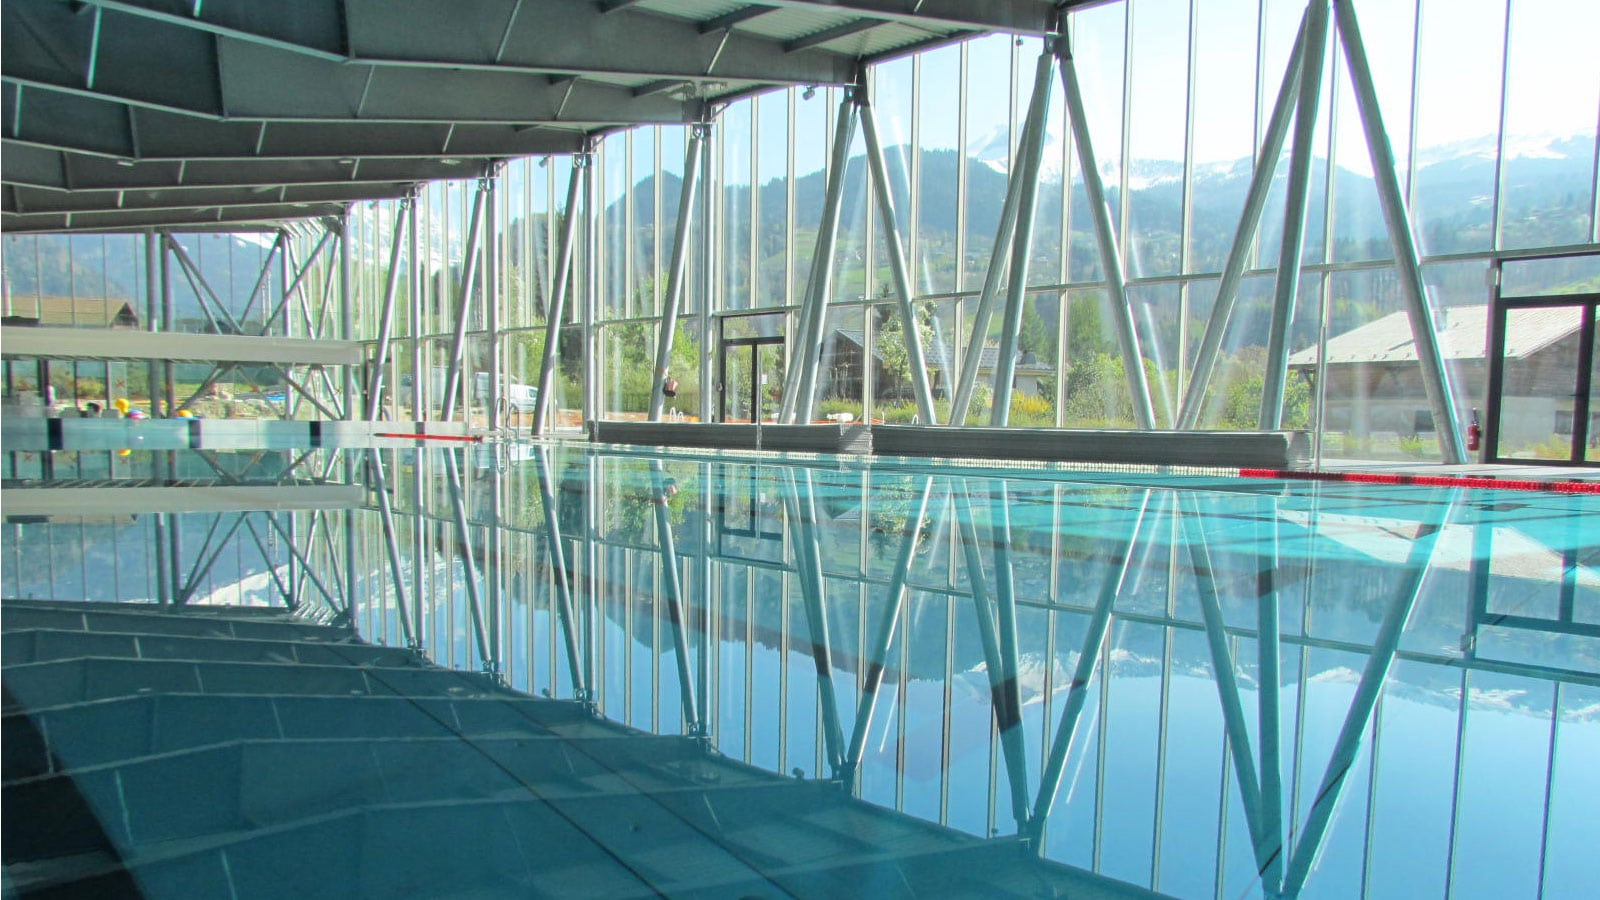 Swimming Pool-Saint-Gervais-Les-Bains-16-9 | Unlimited Saint ... concernant Piscine Saint Gervais Les Bains